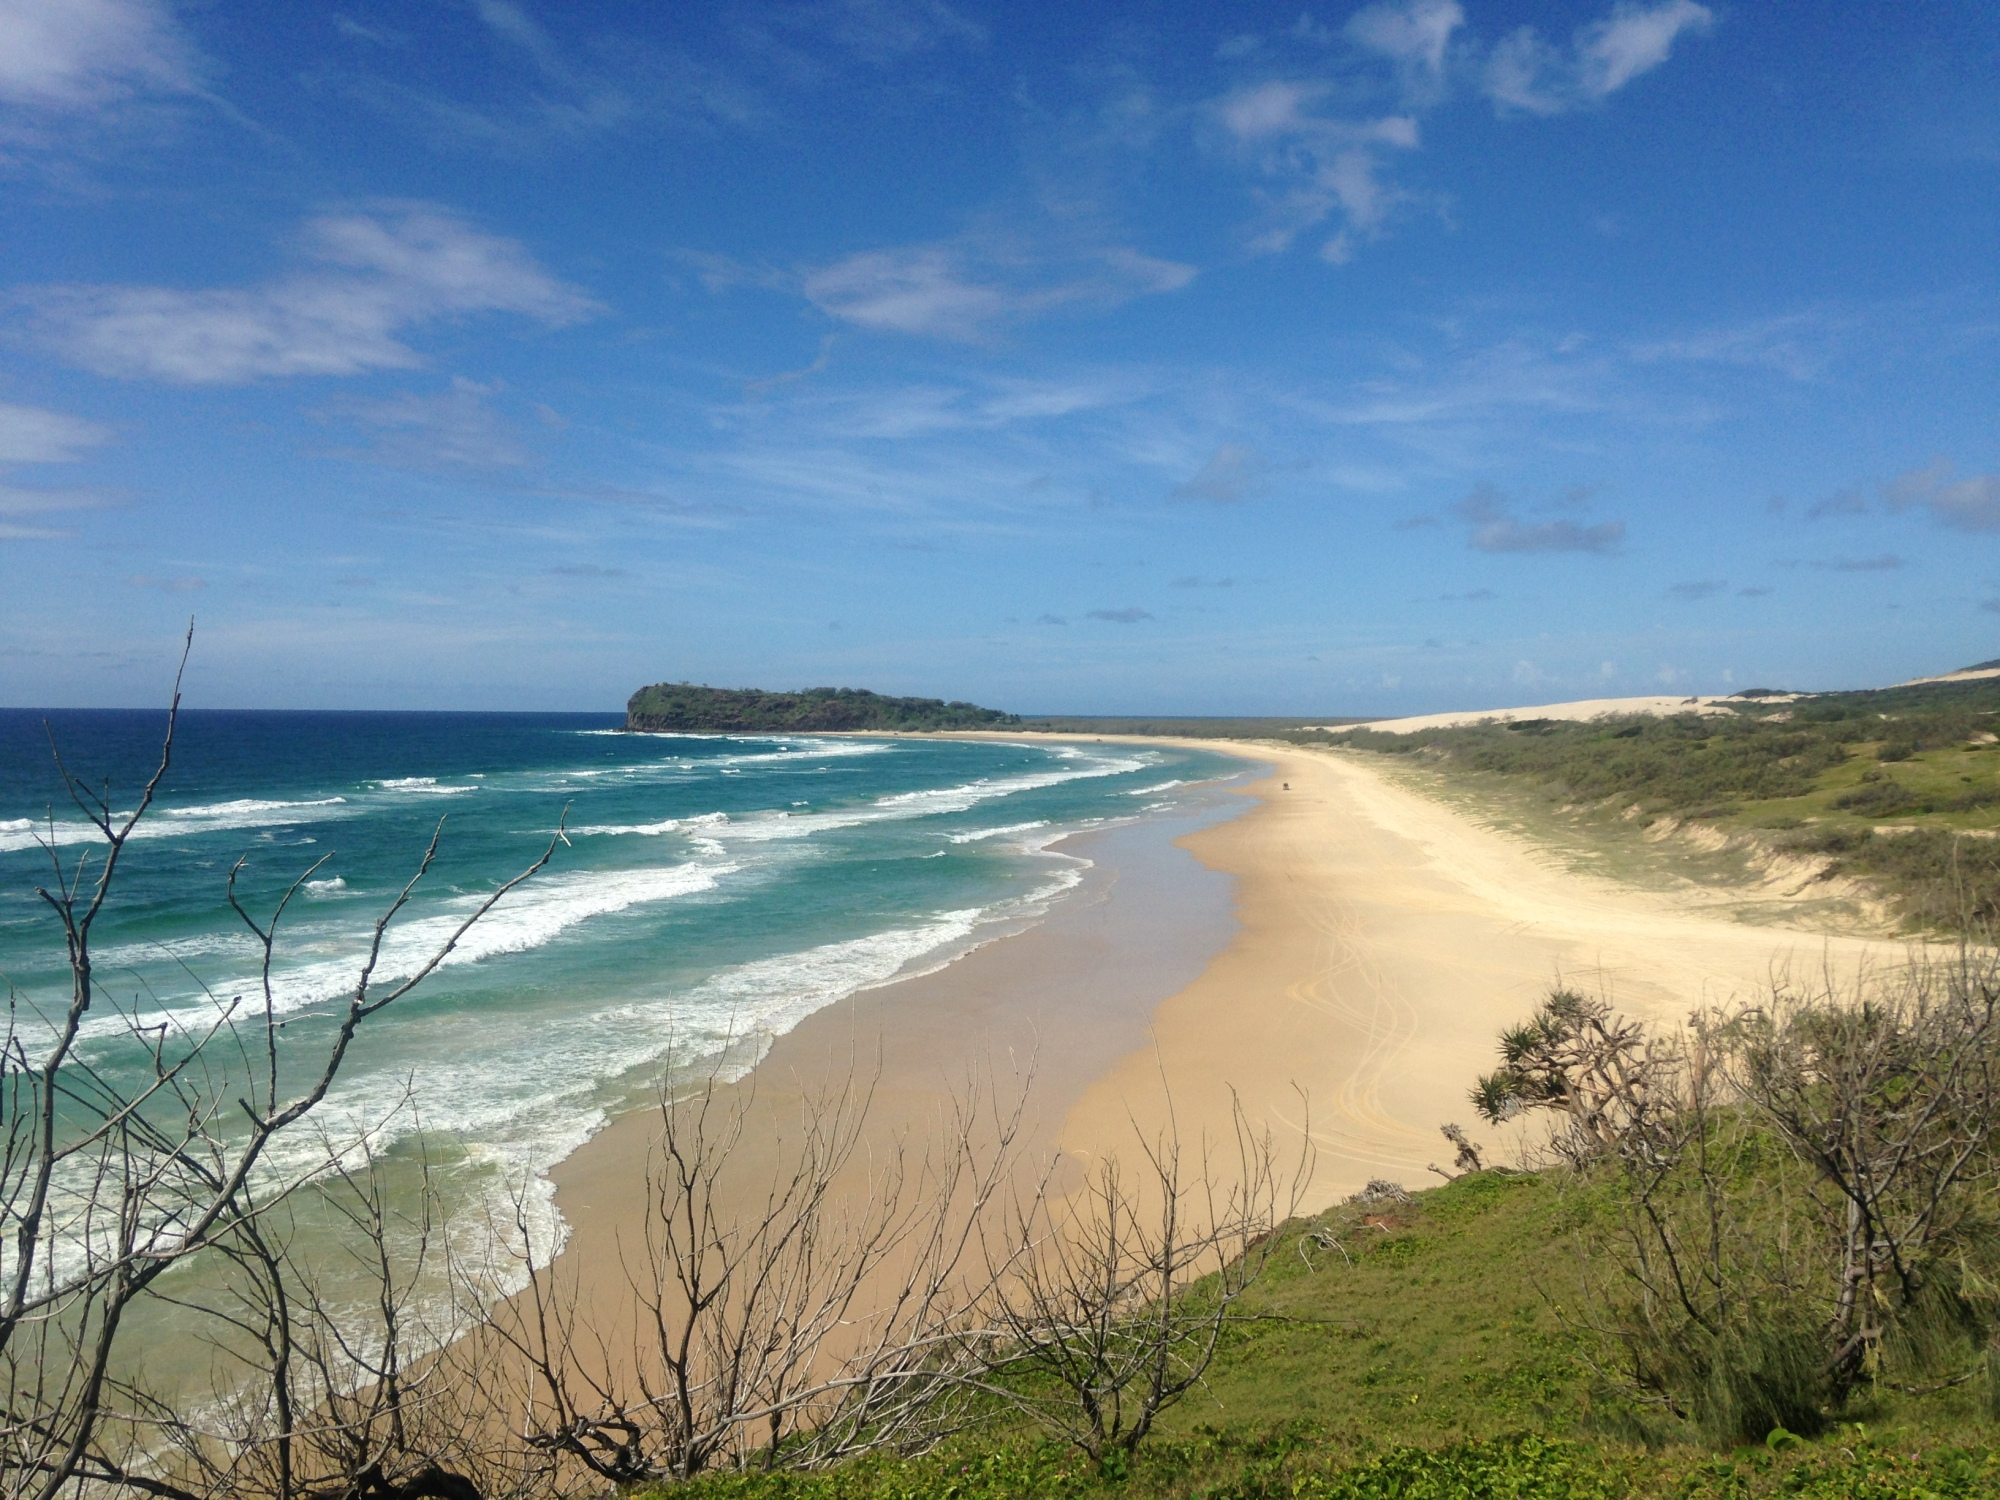 75 Mile Beach on a sunny day with the crashing waves on Fraser Island, Australia